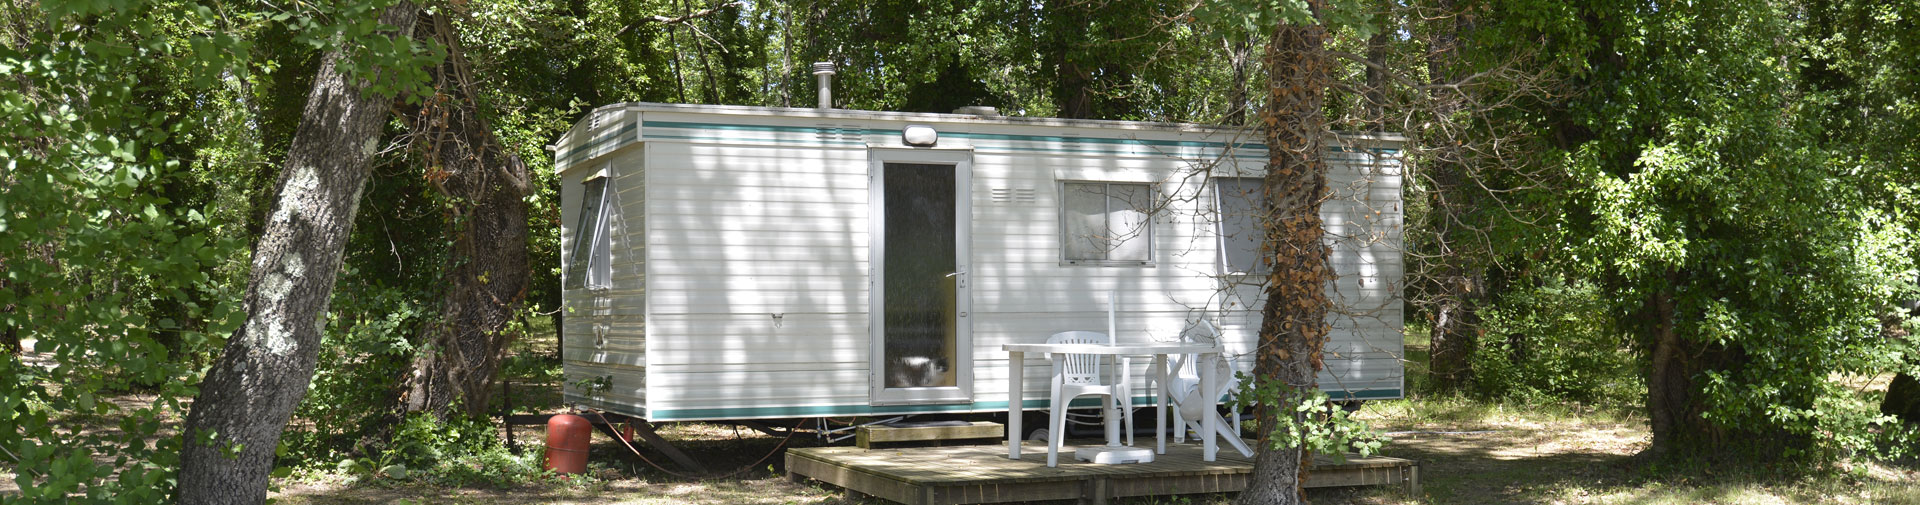 location-mobil-home-gard-4p-sans-sanitaires